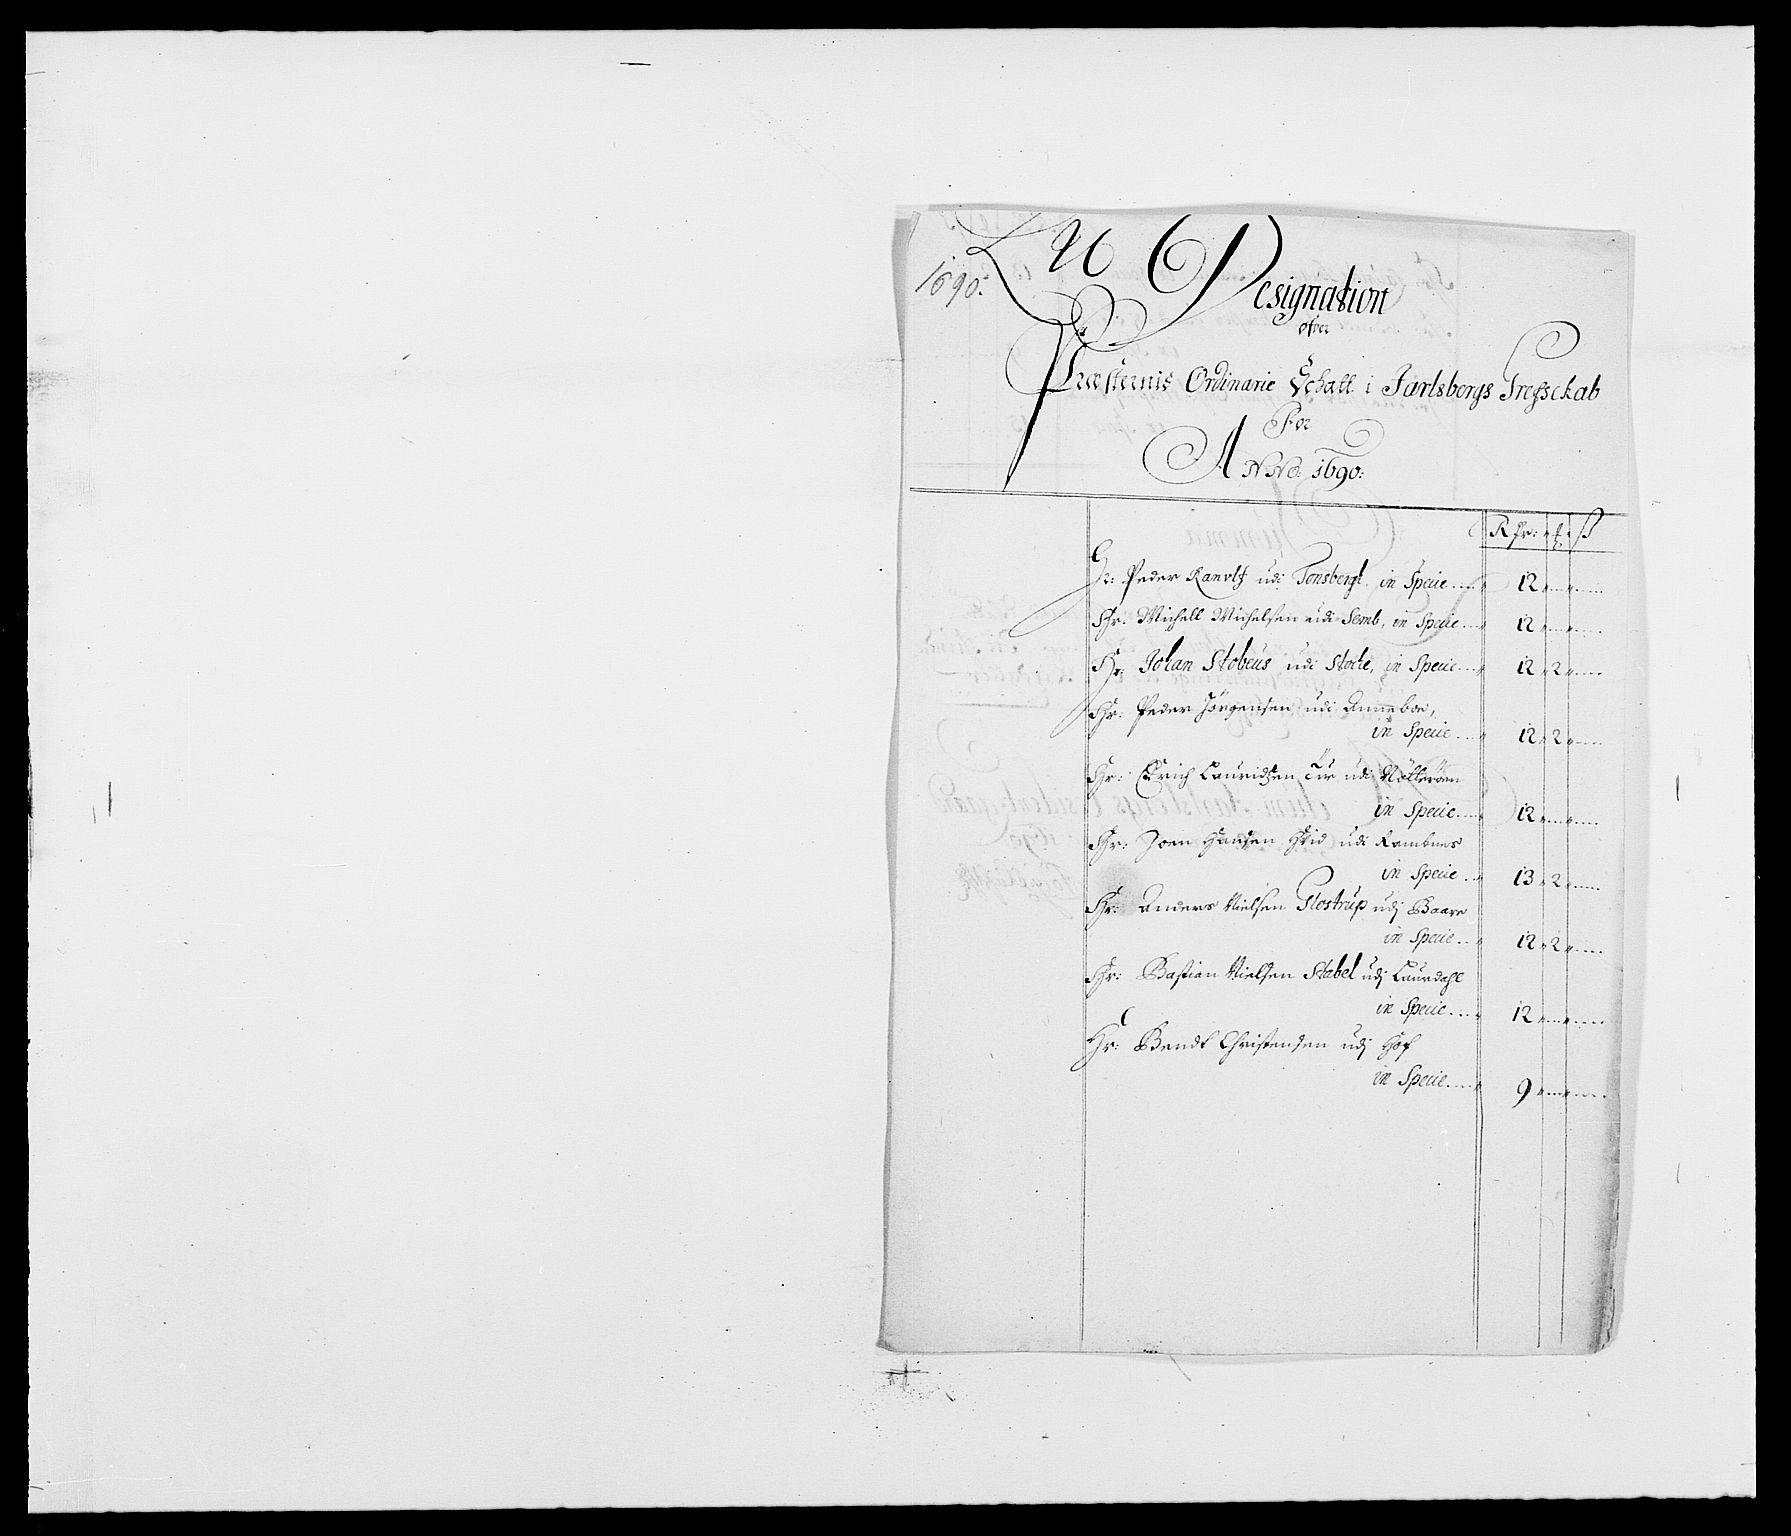 RA, Rentekammeret inntil 1814, Reviderte regnskaper, Fogderegnskap, R32/L1861: Fogderegnskap Jarlsberg grevskap, 1686-1690, s. 351